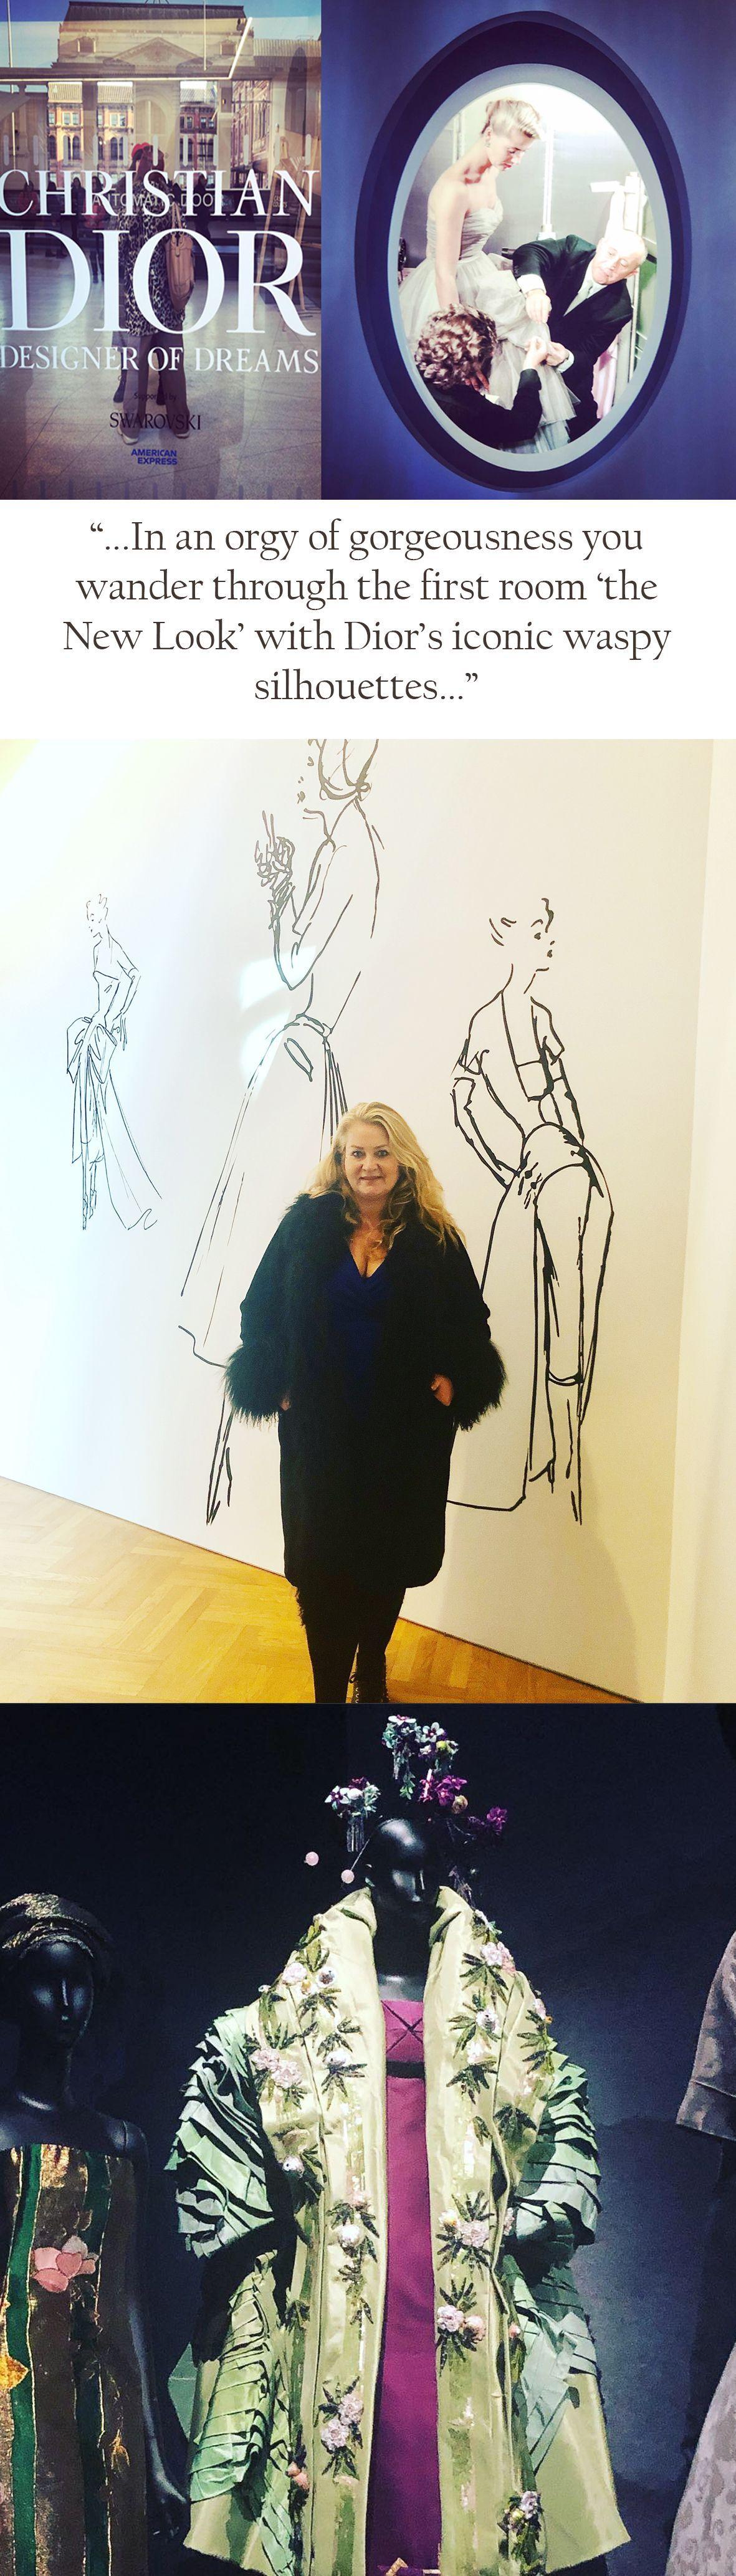 The V&A Christian Dior: Designer of Dreams Exhibition Blog by Anna Scholz  #Anna #Blog #Christian #Designer #Dior #Dreams #Exhibition #Scholz